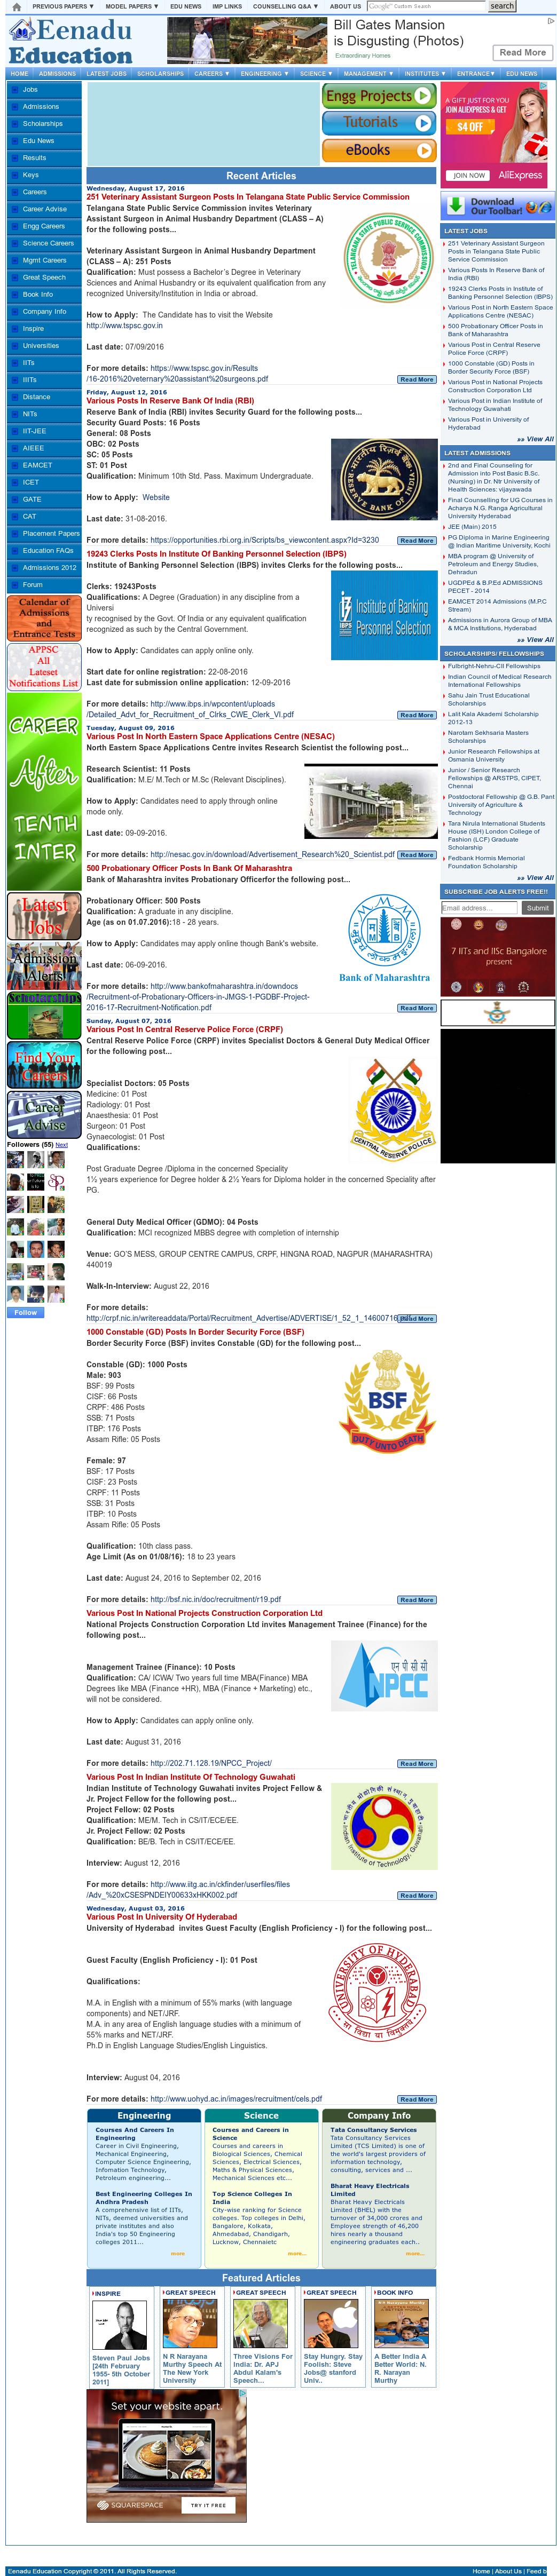 Eenadu Education Competitors, Revenue and Employees - Owler